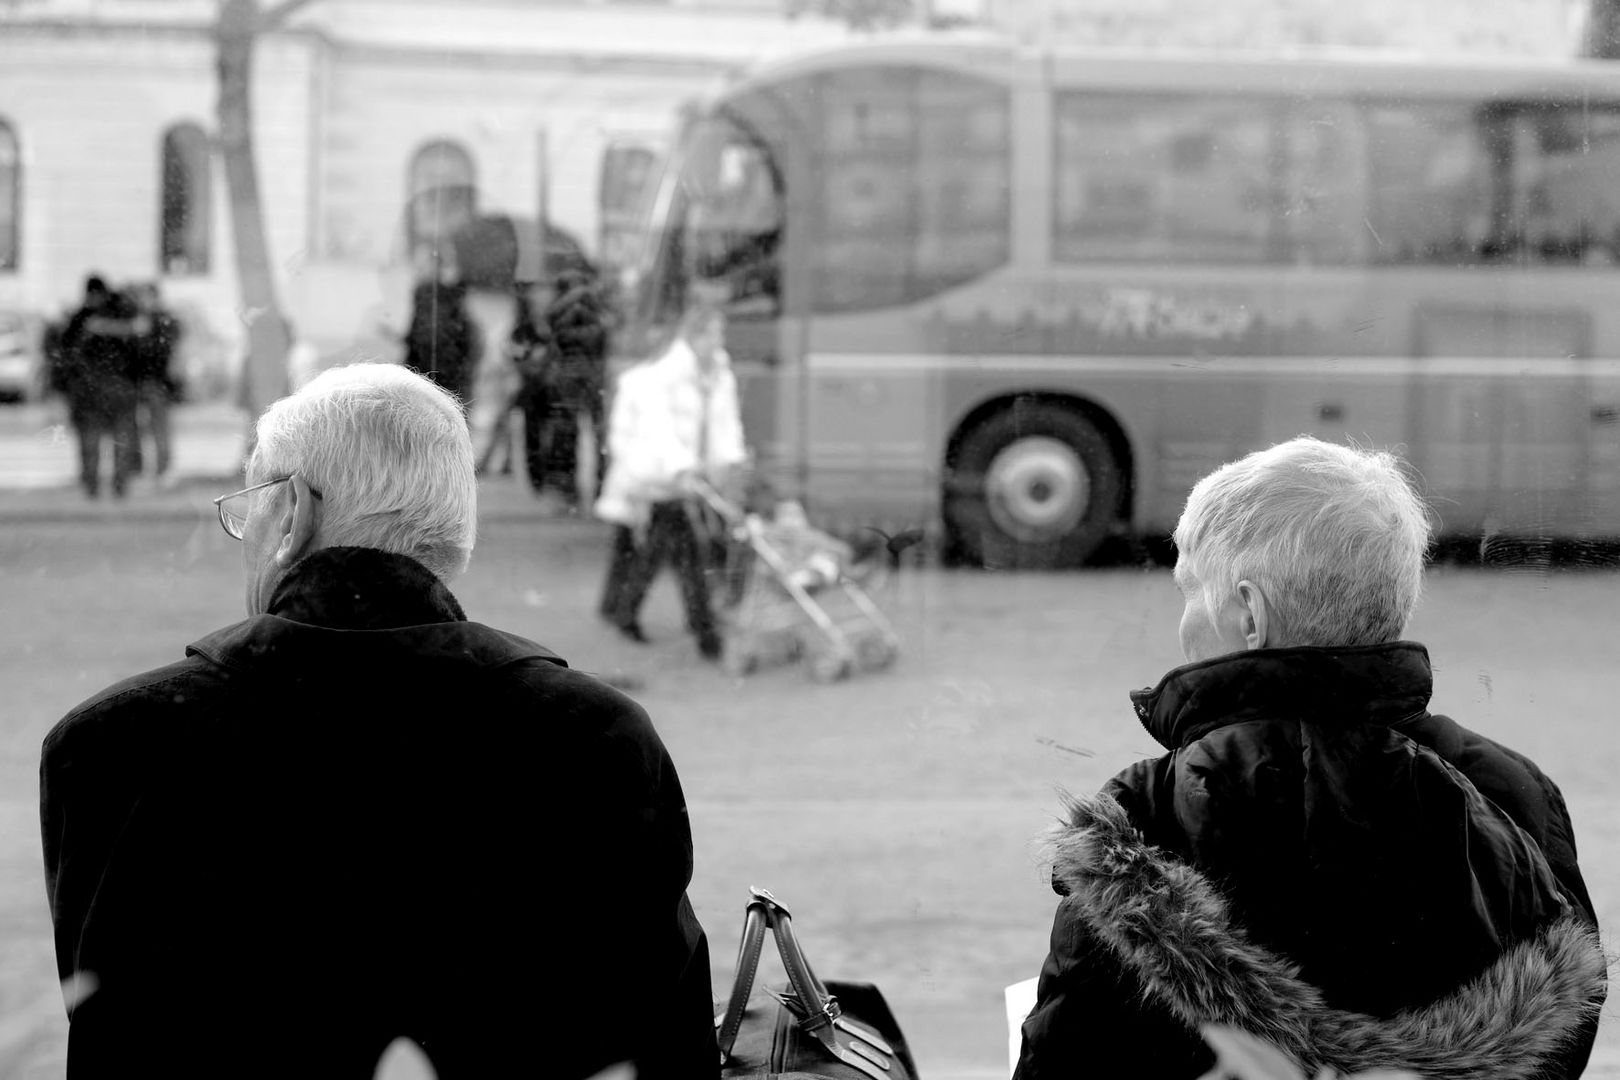 Street Photography 12